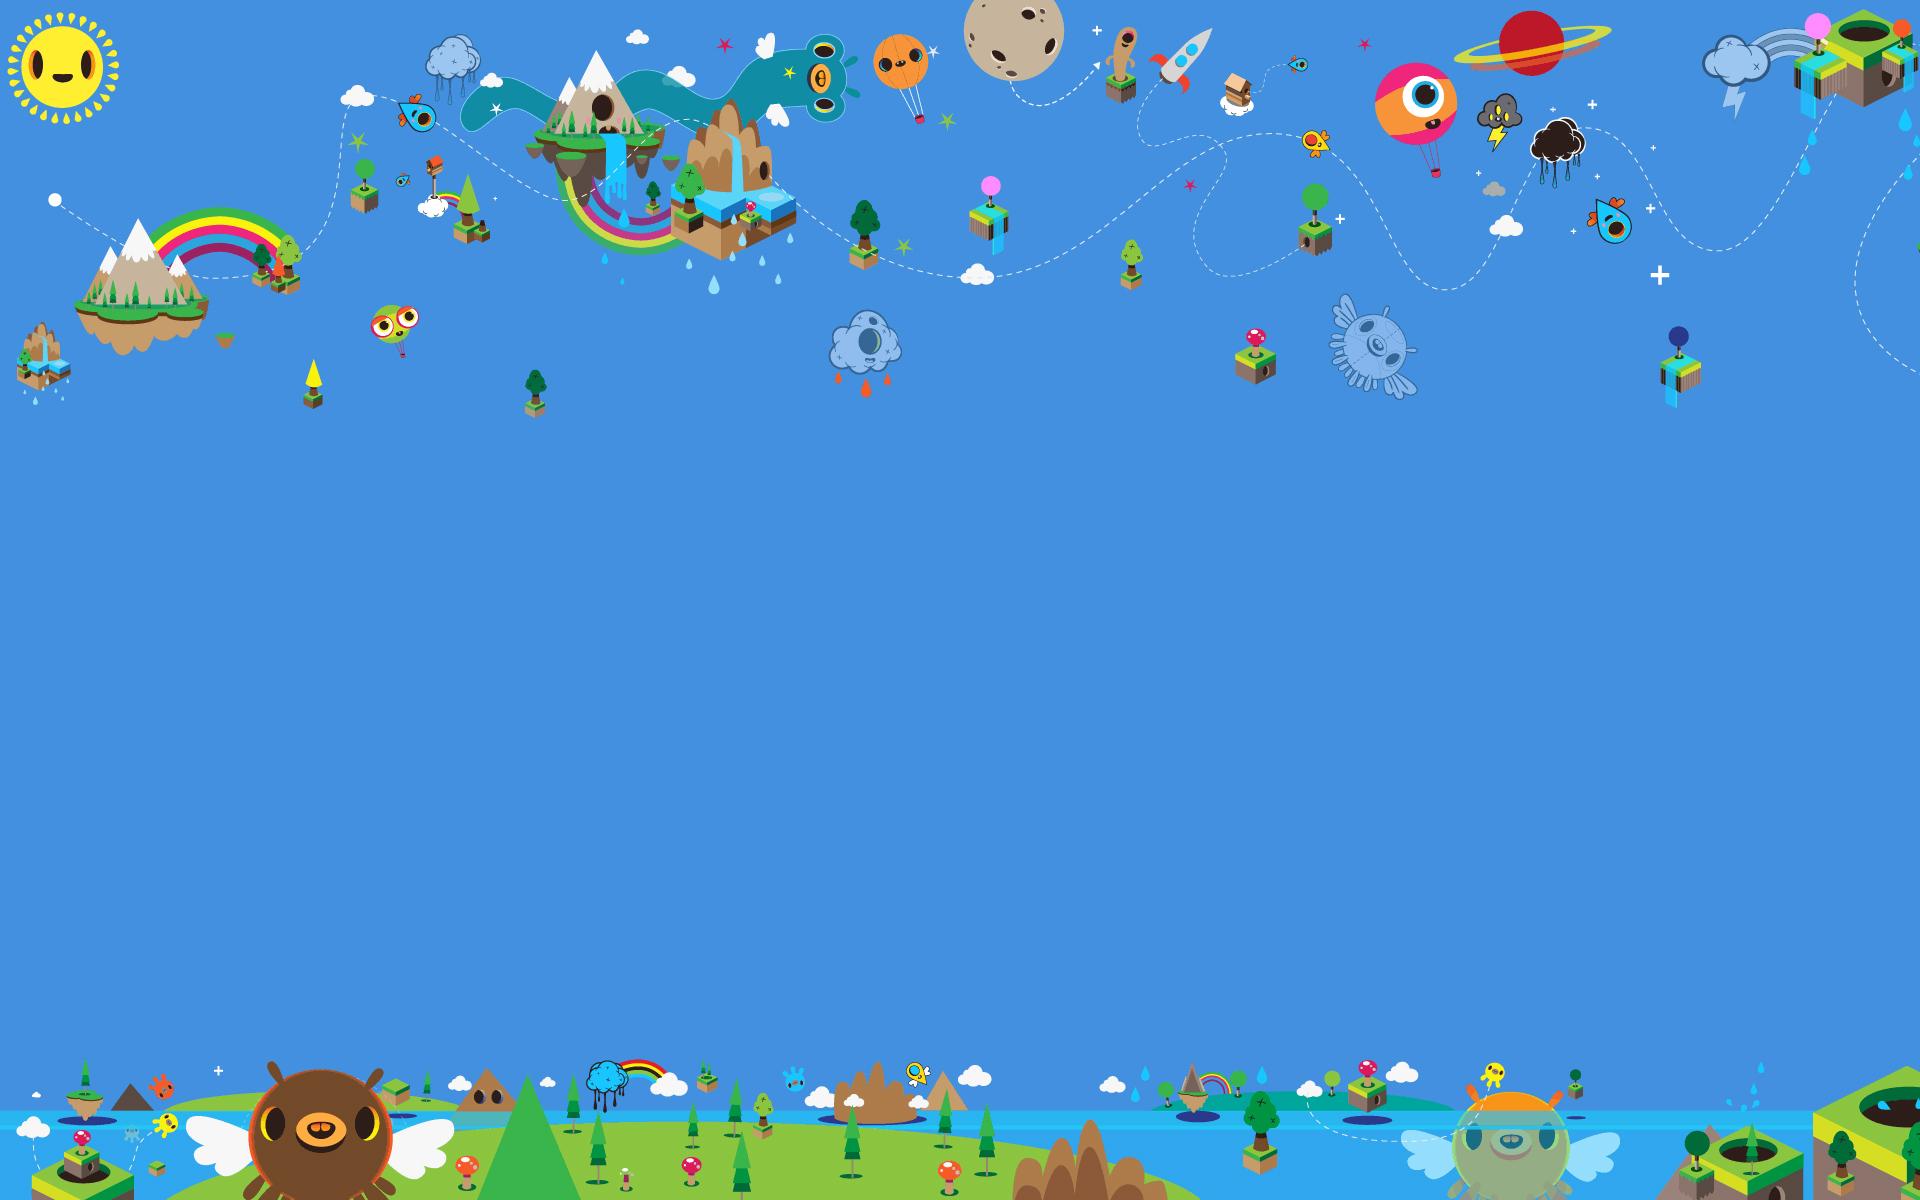 Windows 8 Pro Start Wallpaper 1 By Brebenel Silviu On Deviantart